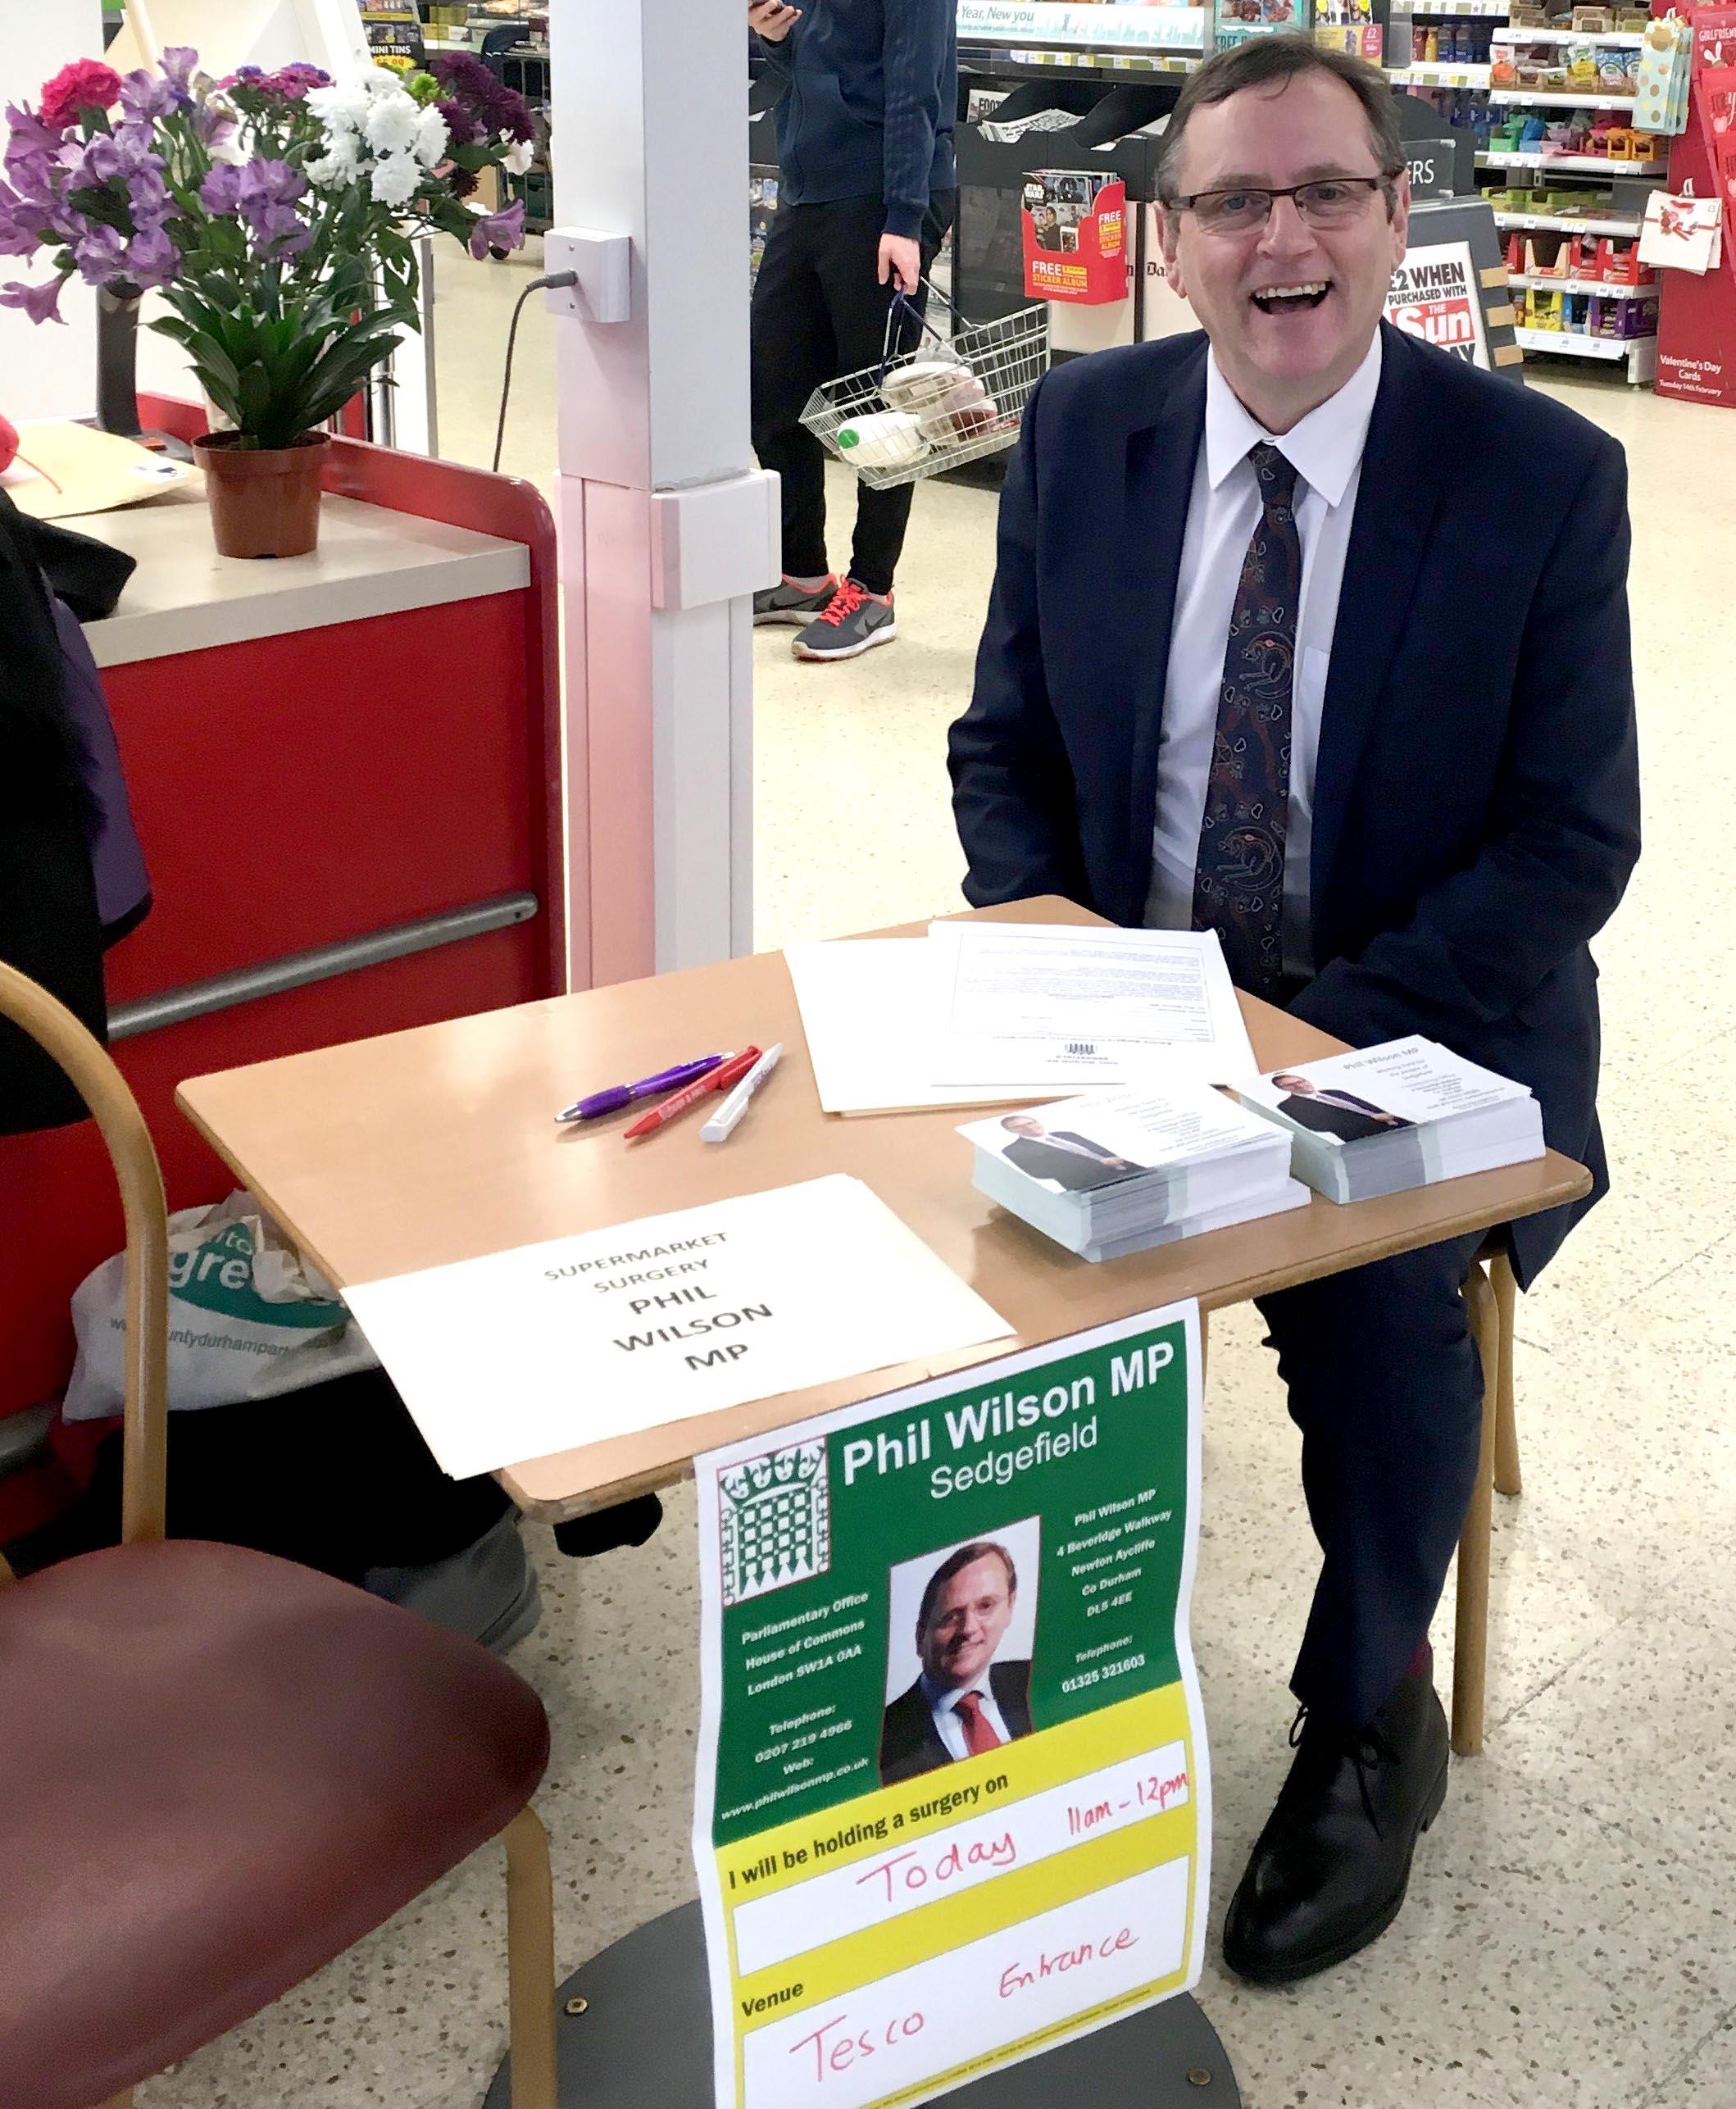 Customers Meet MP Phil in Tesco's